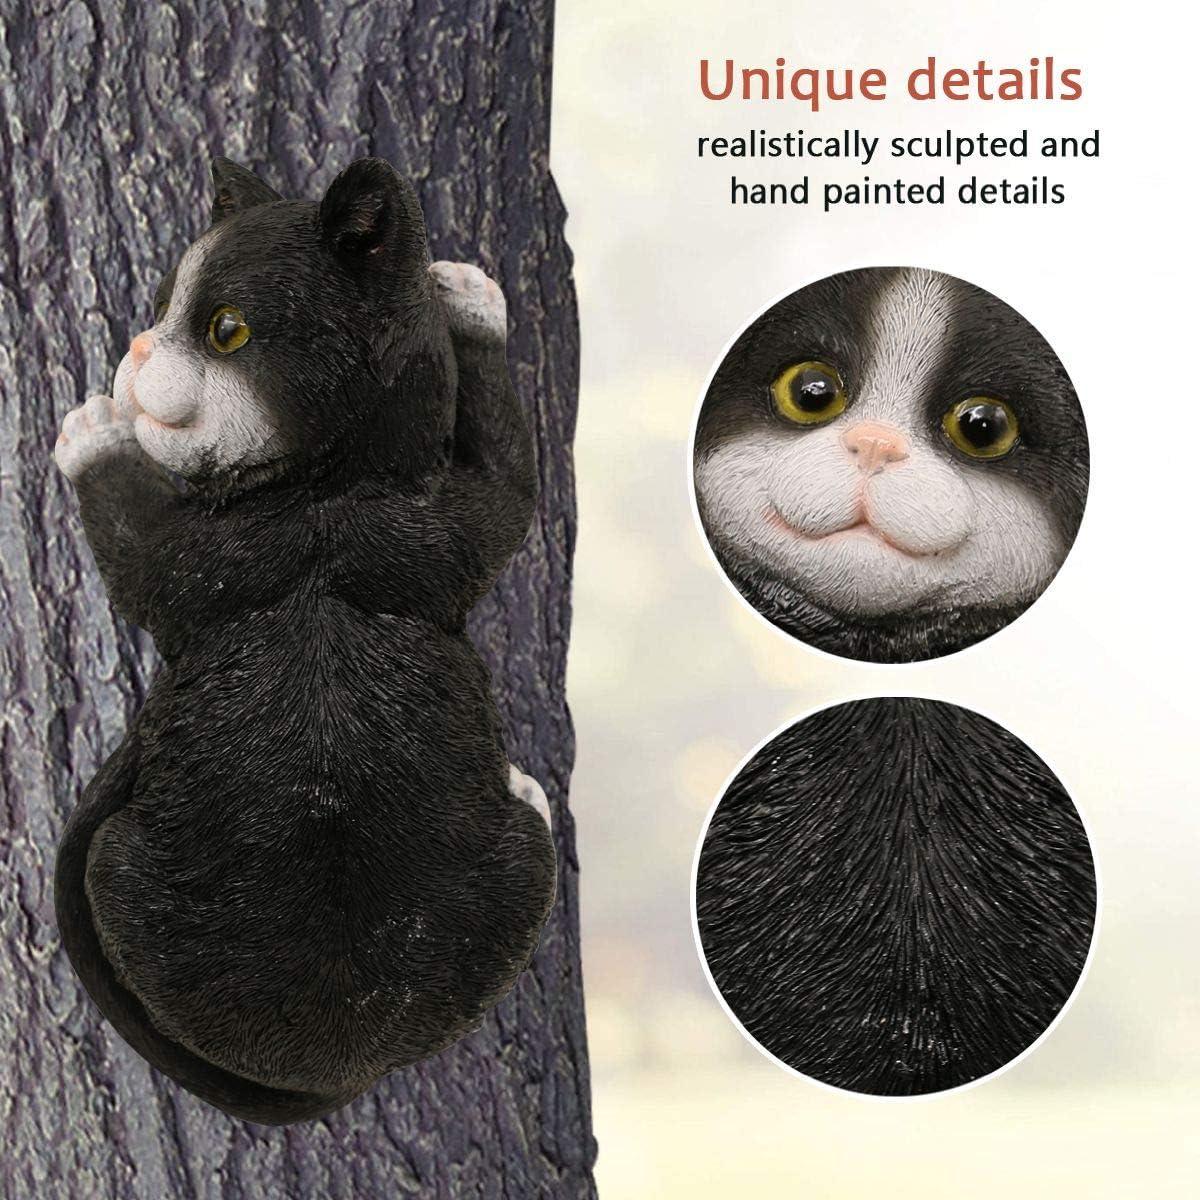 Black Cat Gifts and Garden D/écor Statue Face for Trees 9 x 4.7 inch LIMEIDE Cat Tree Hugger Tree Garden Peeker Polyresin Outdoor Tree Sculpture